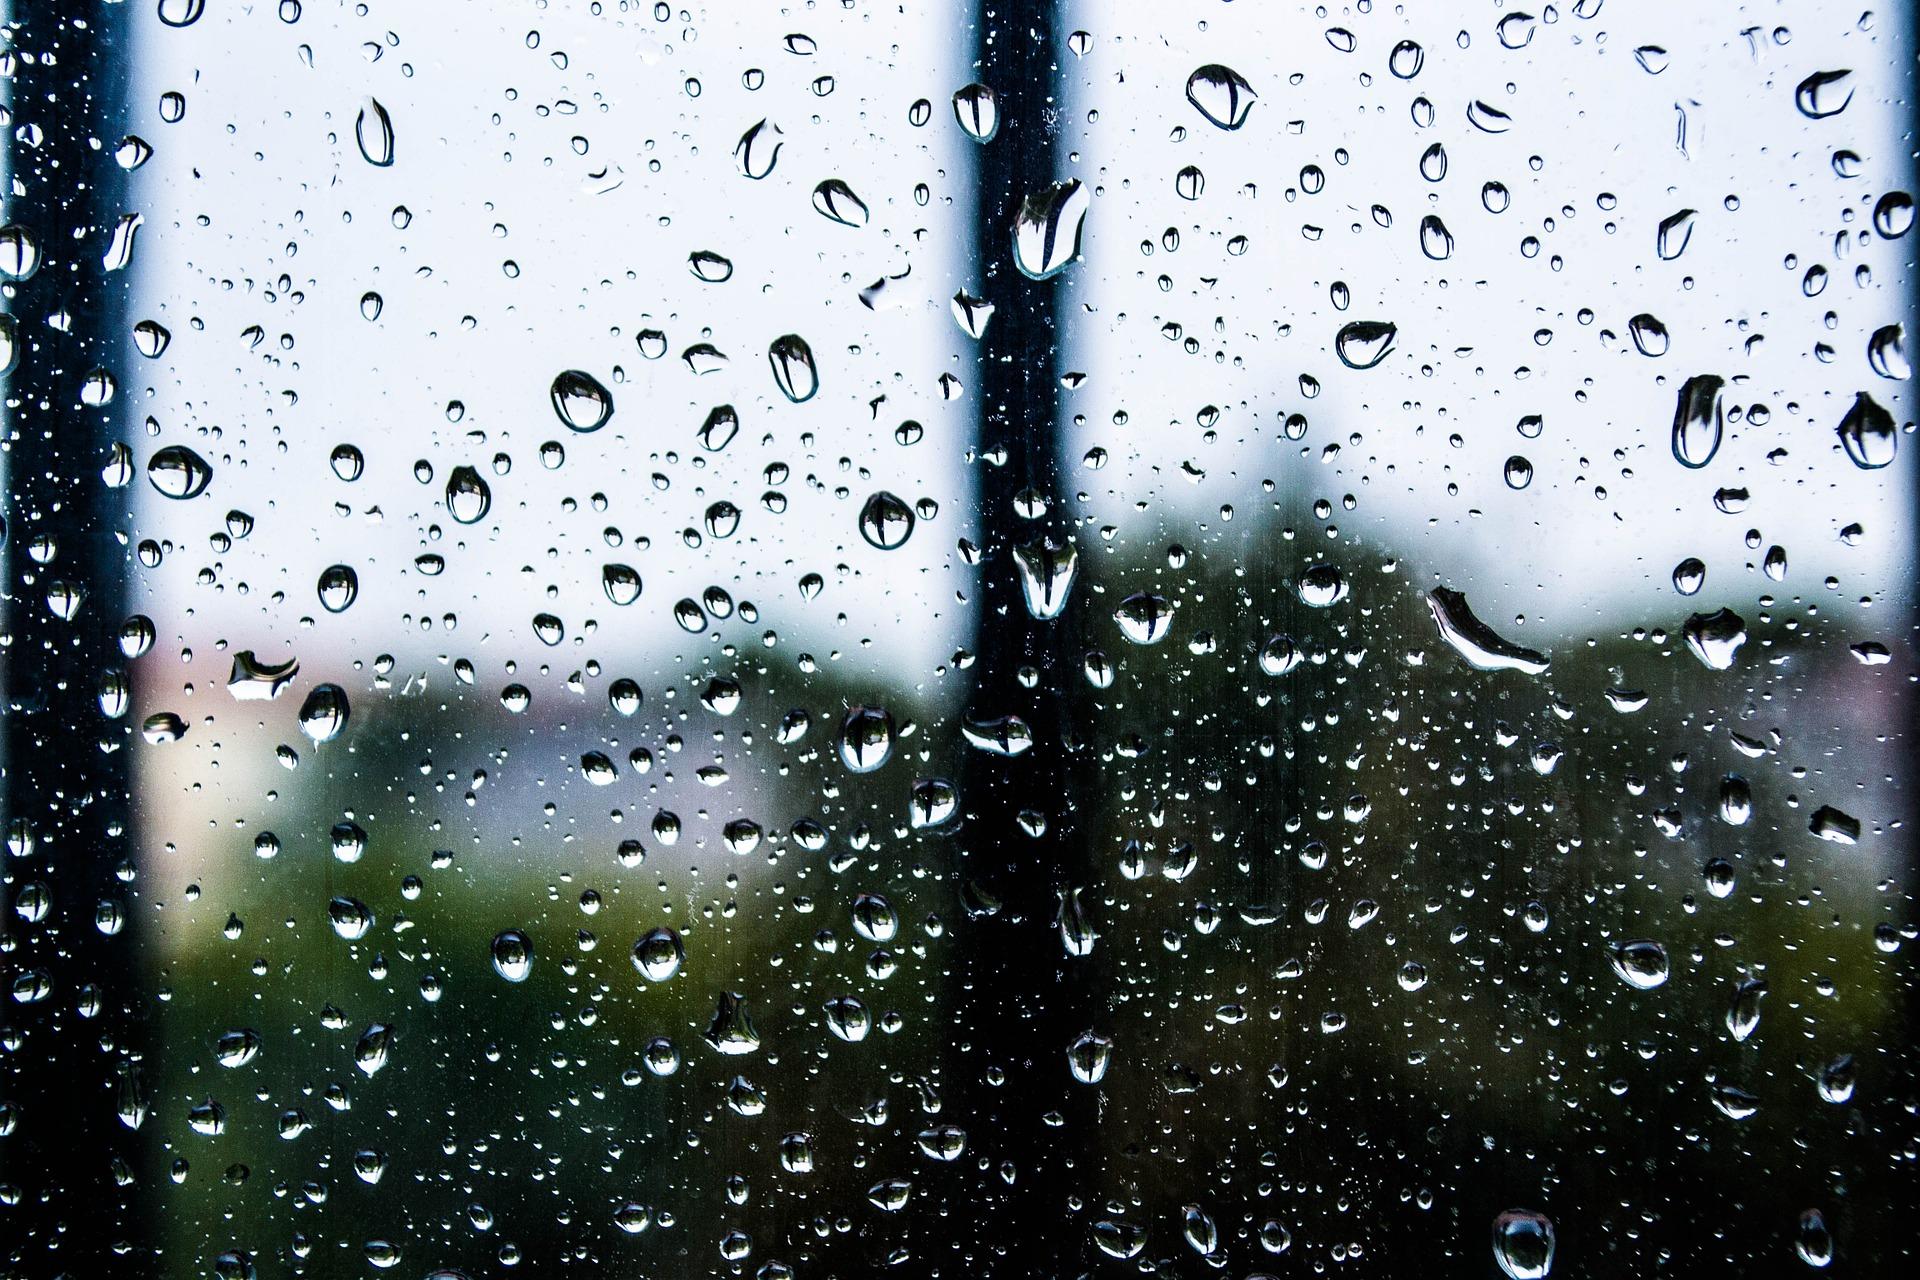 rain-692985_1920